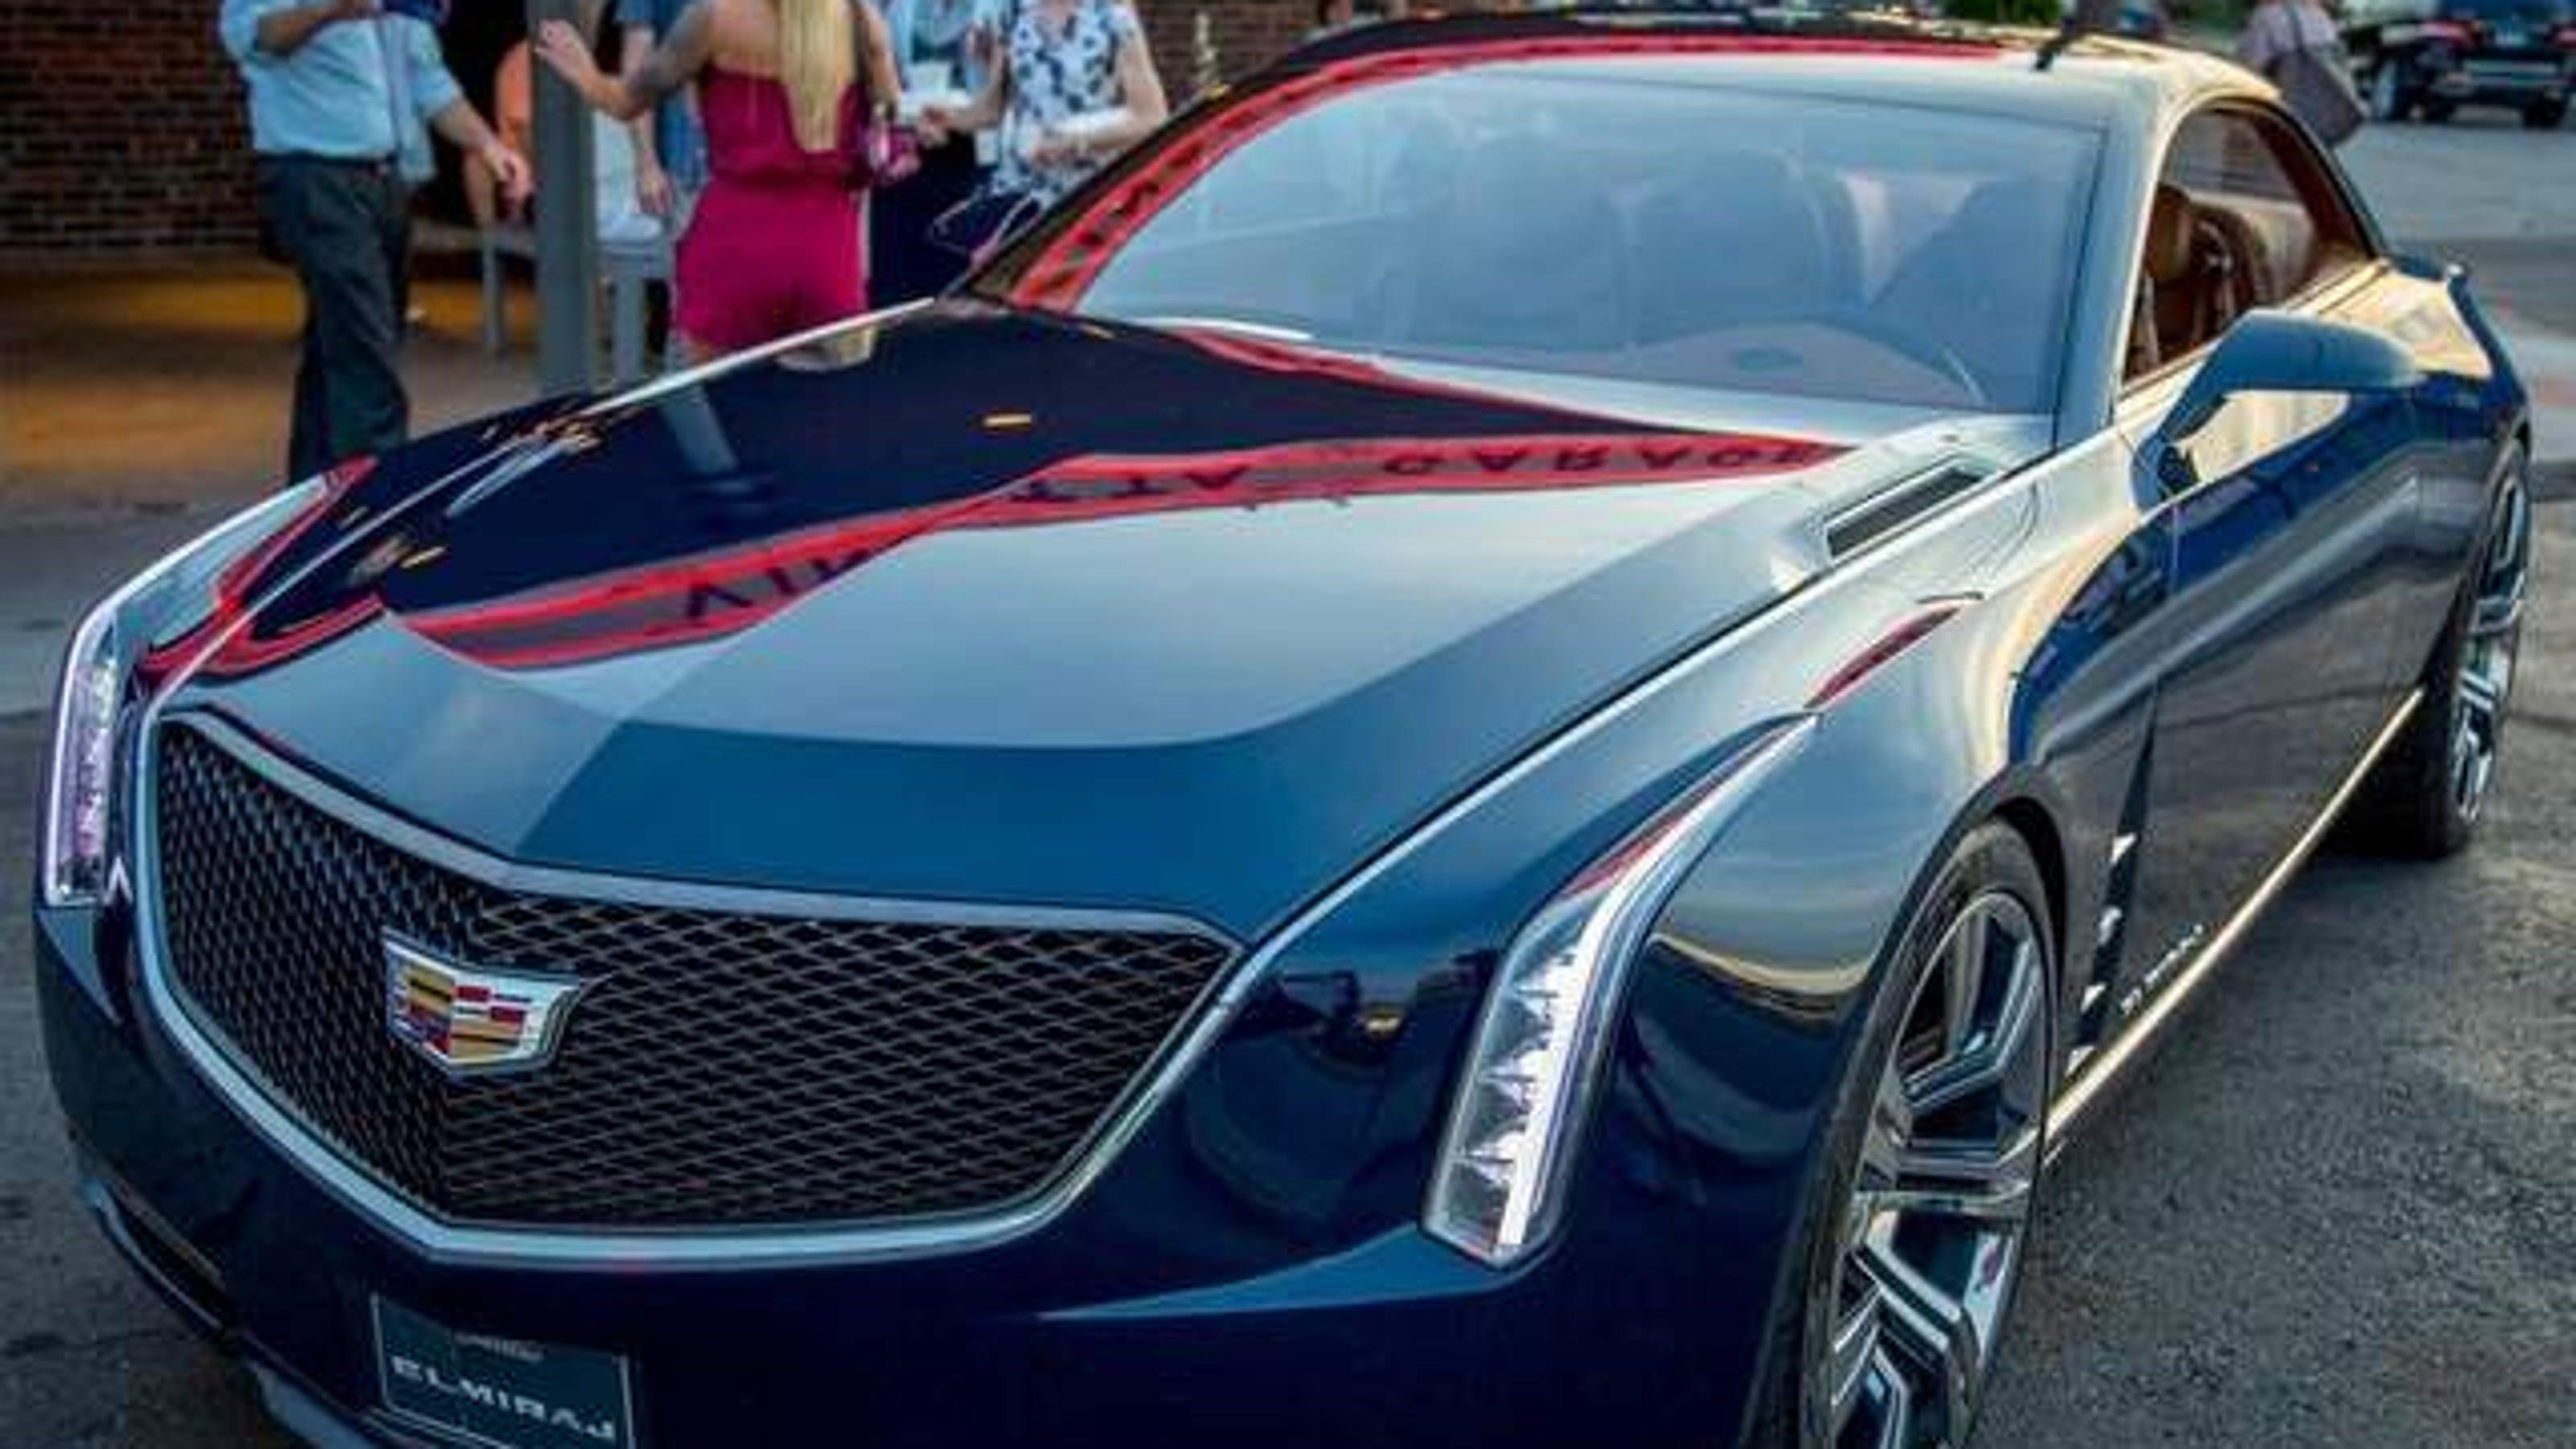 2017 Cadillacs May Have Beginnings Of Driverless Tech